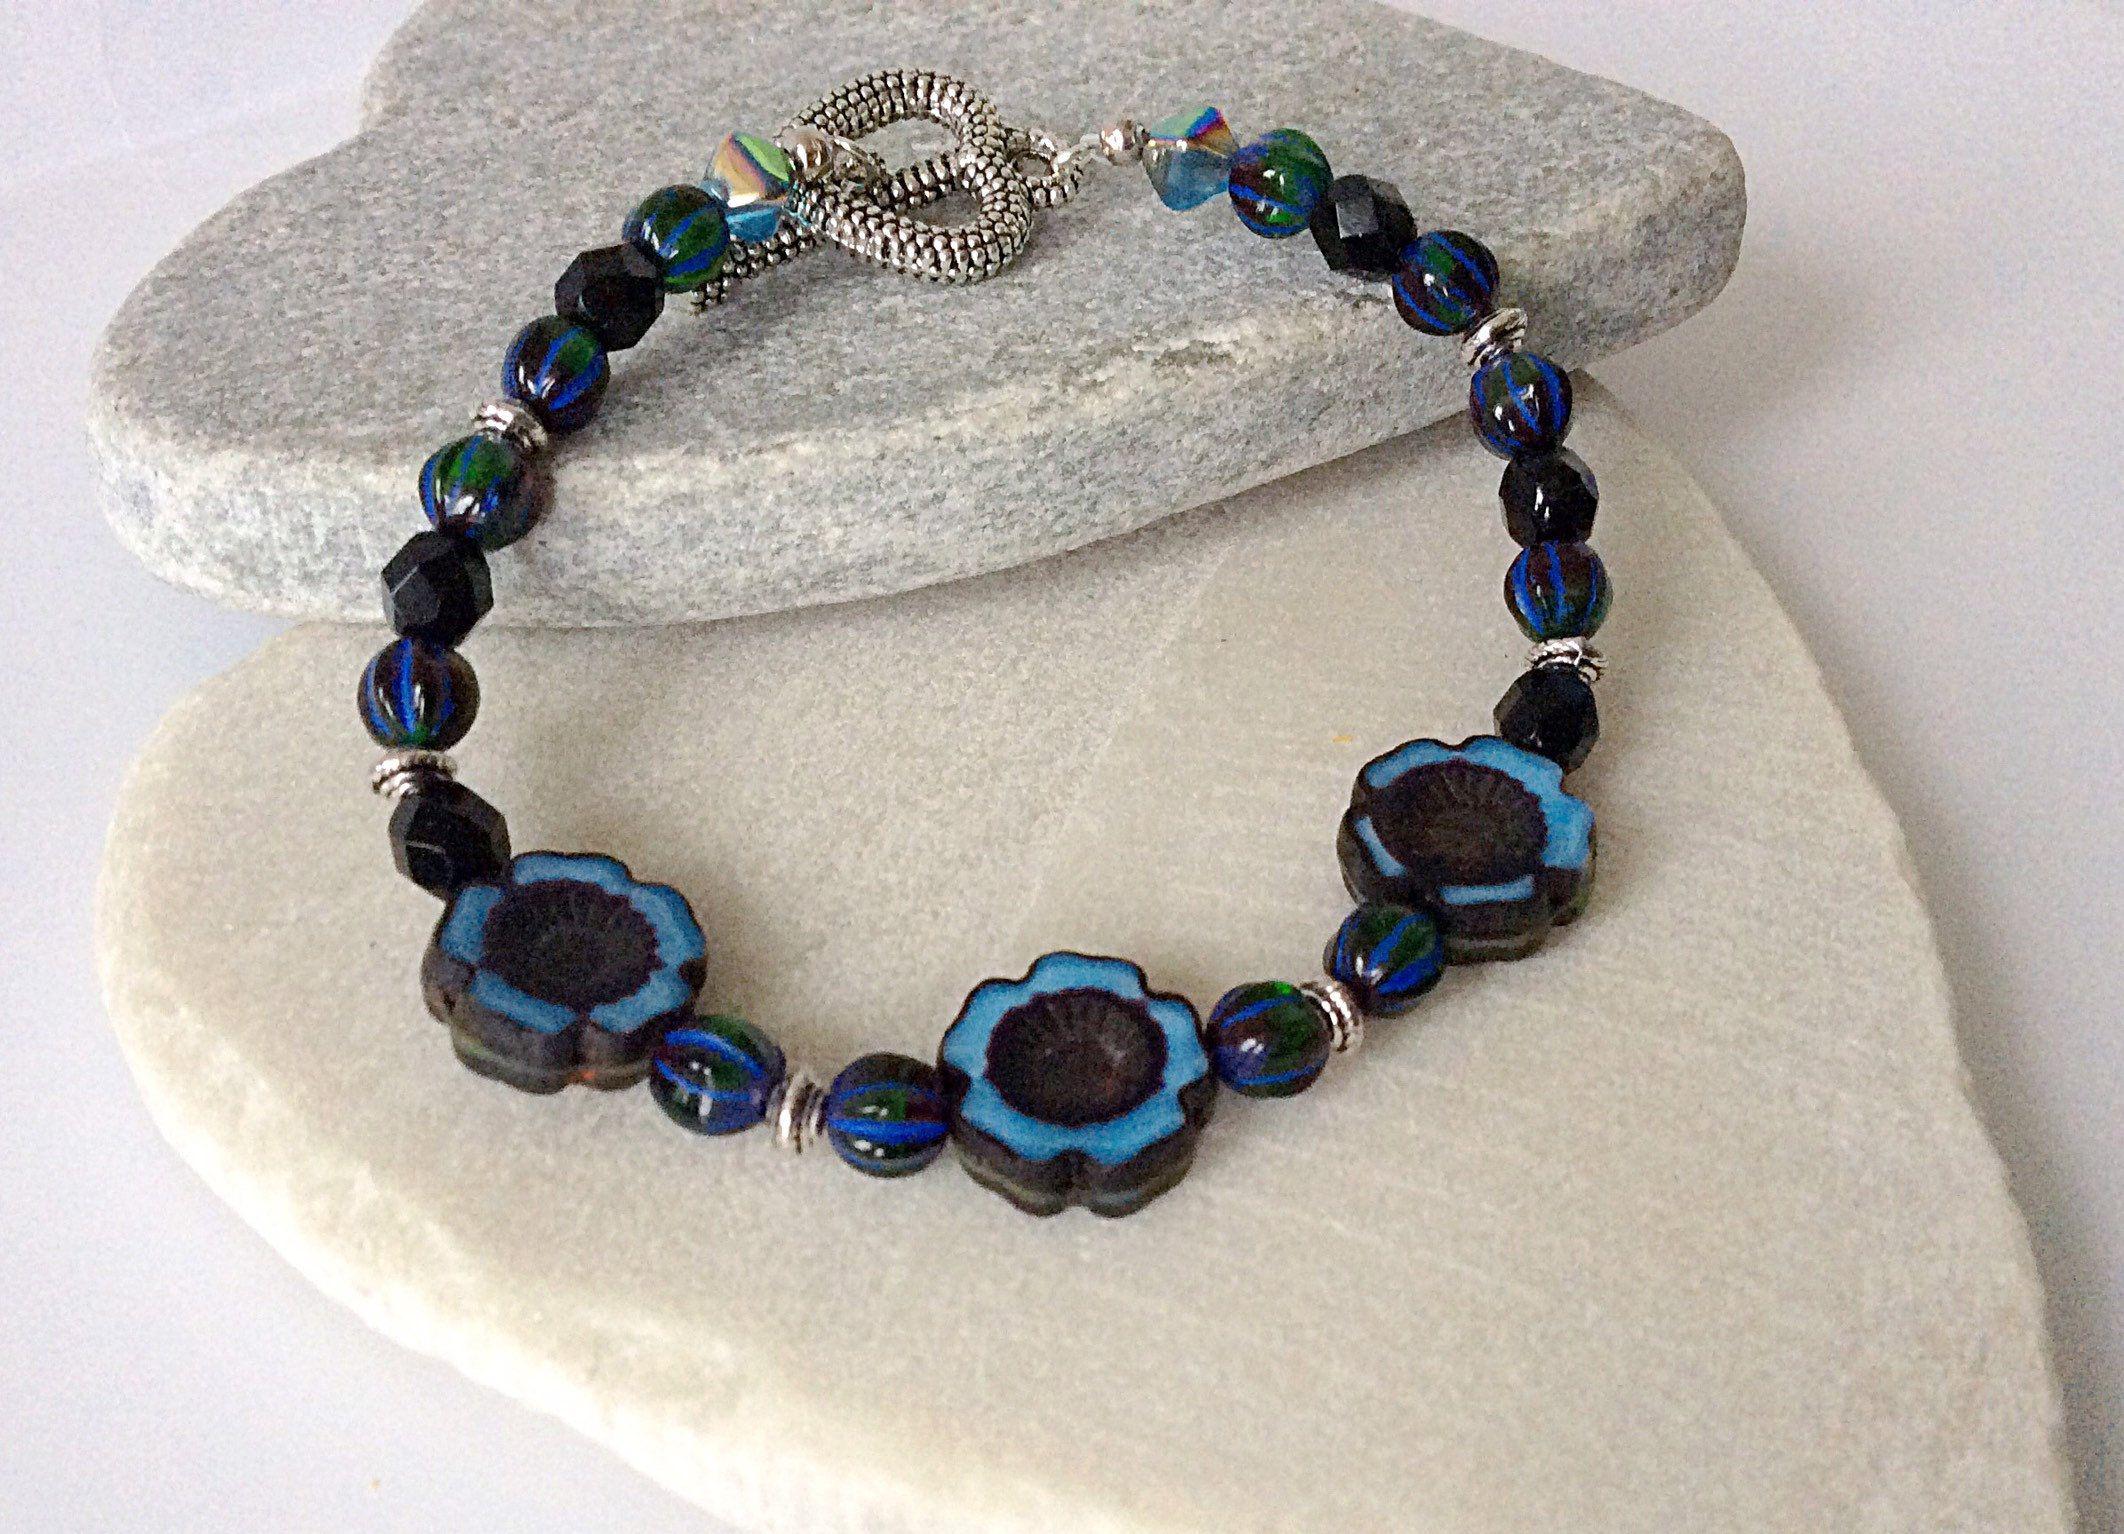 Beaded Teal and Black Flower Bracelet